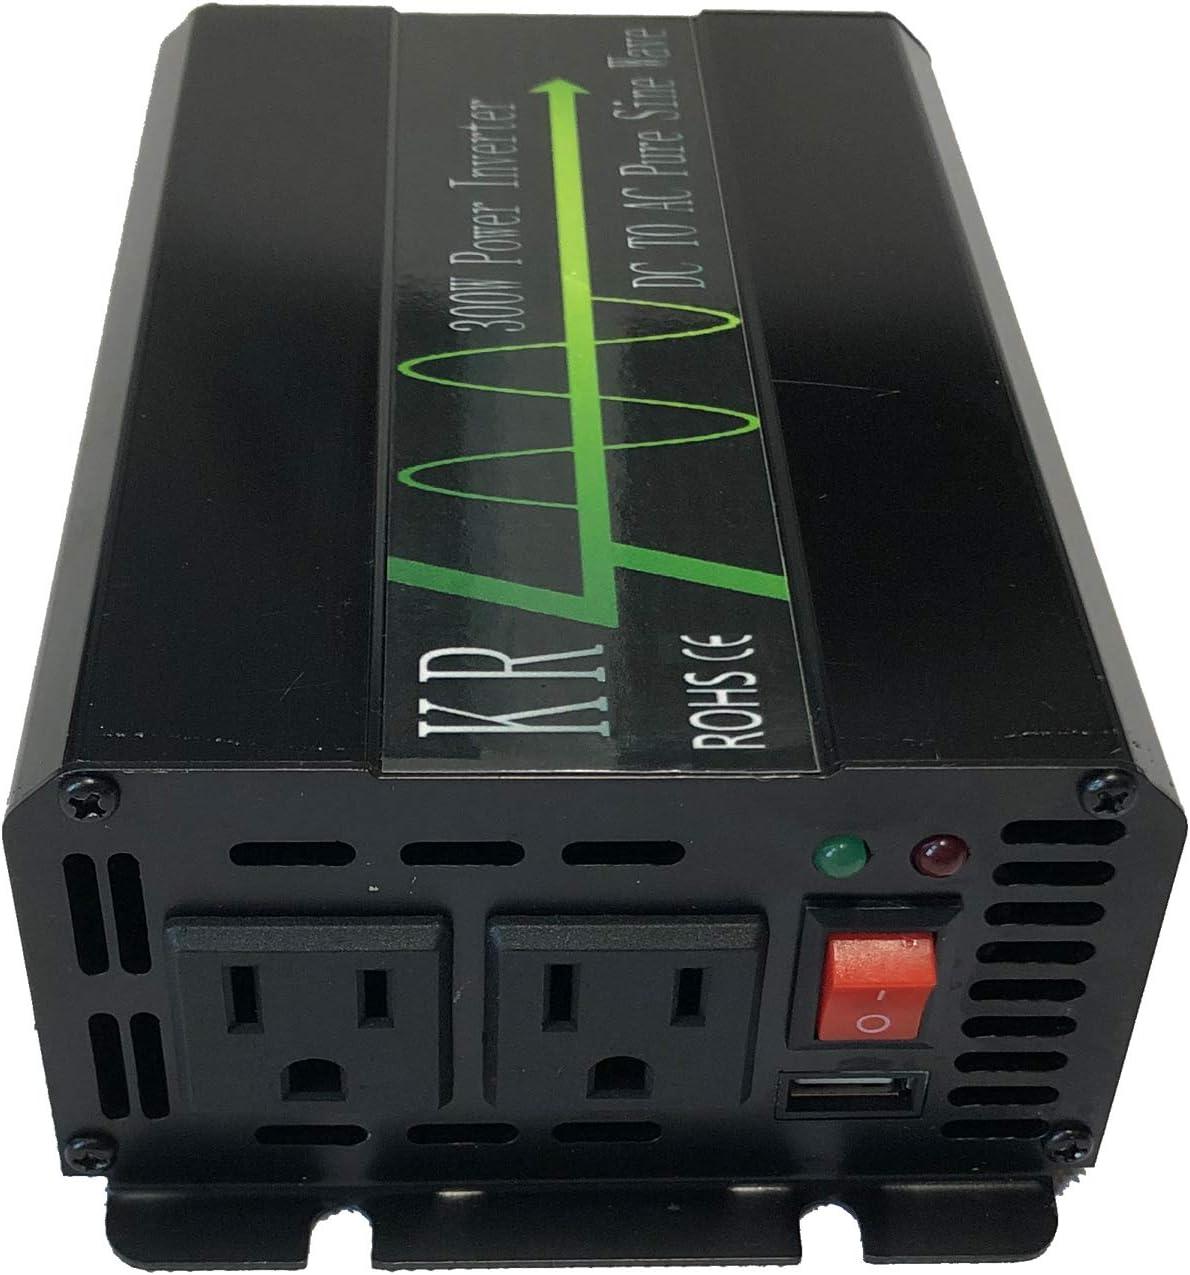 KRXNY 300W Power Inverter 24V DC to 120V AC Converter 60HZ Pure Sine Wave with USB Port for Car/RV/Home Solar